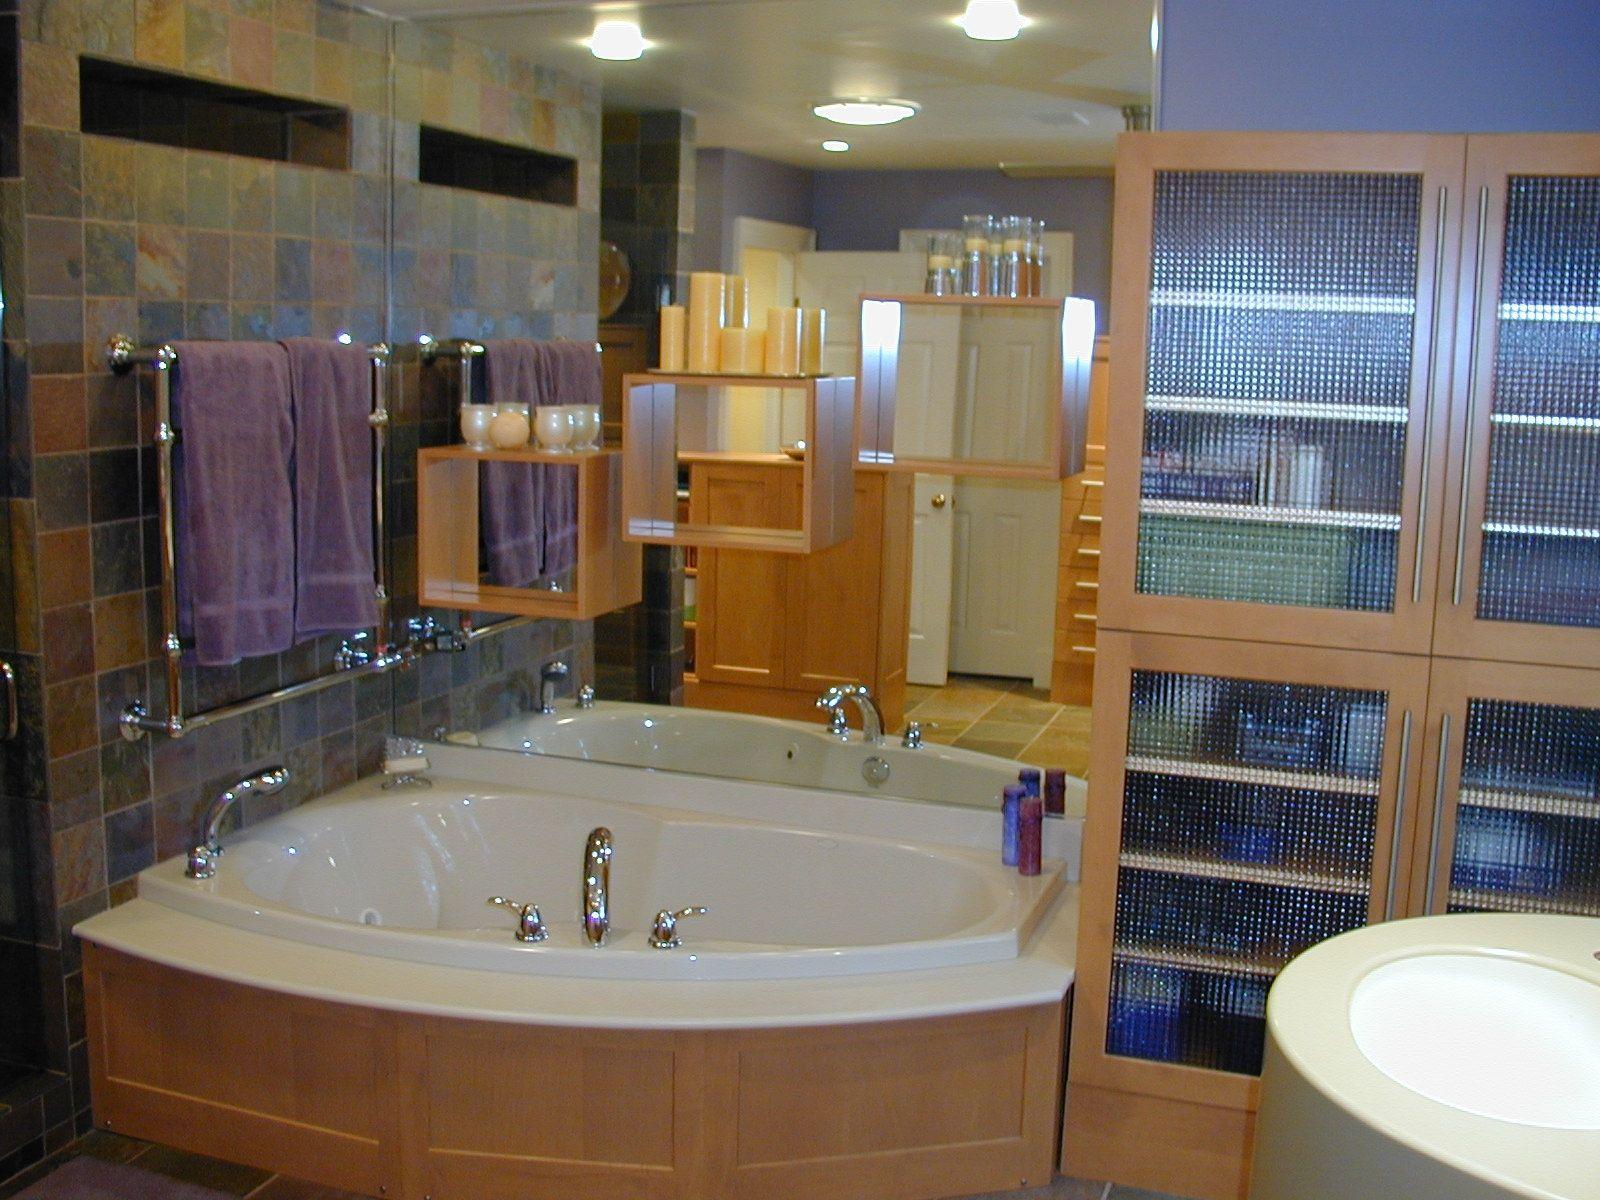 Bathroom Remodeling Richmond VA Bathroom Remodeling Pinterest - Bathroom contractors richmond va for bathroom decor ideas